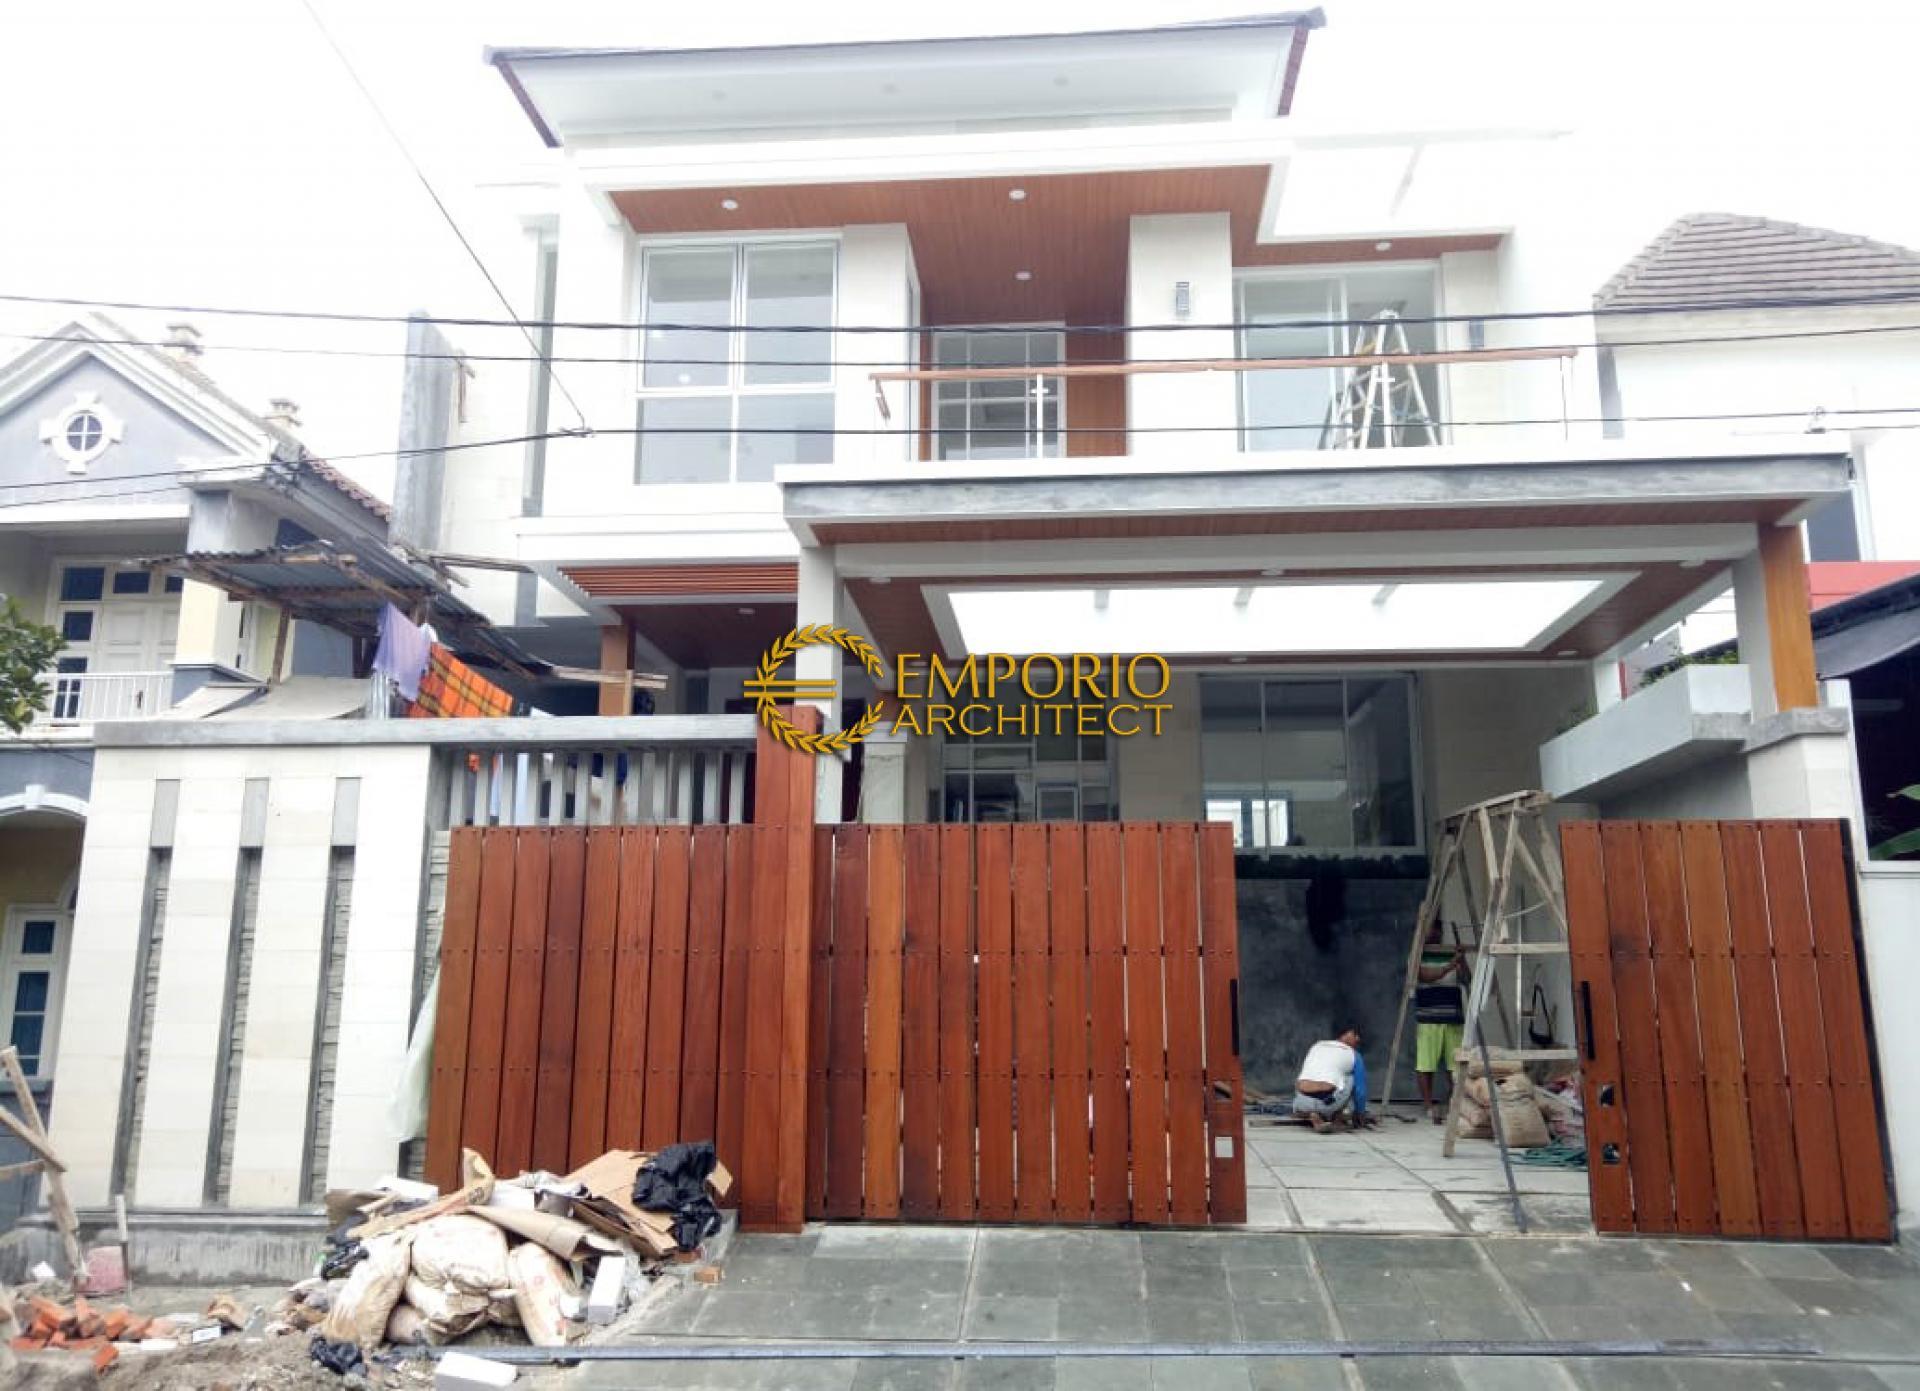 Construction Progress of Mr. Ngurah Indira Private House - Tangerang Selatan, Banten